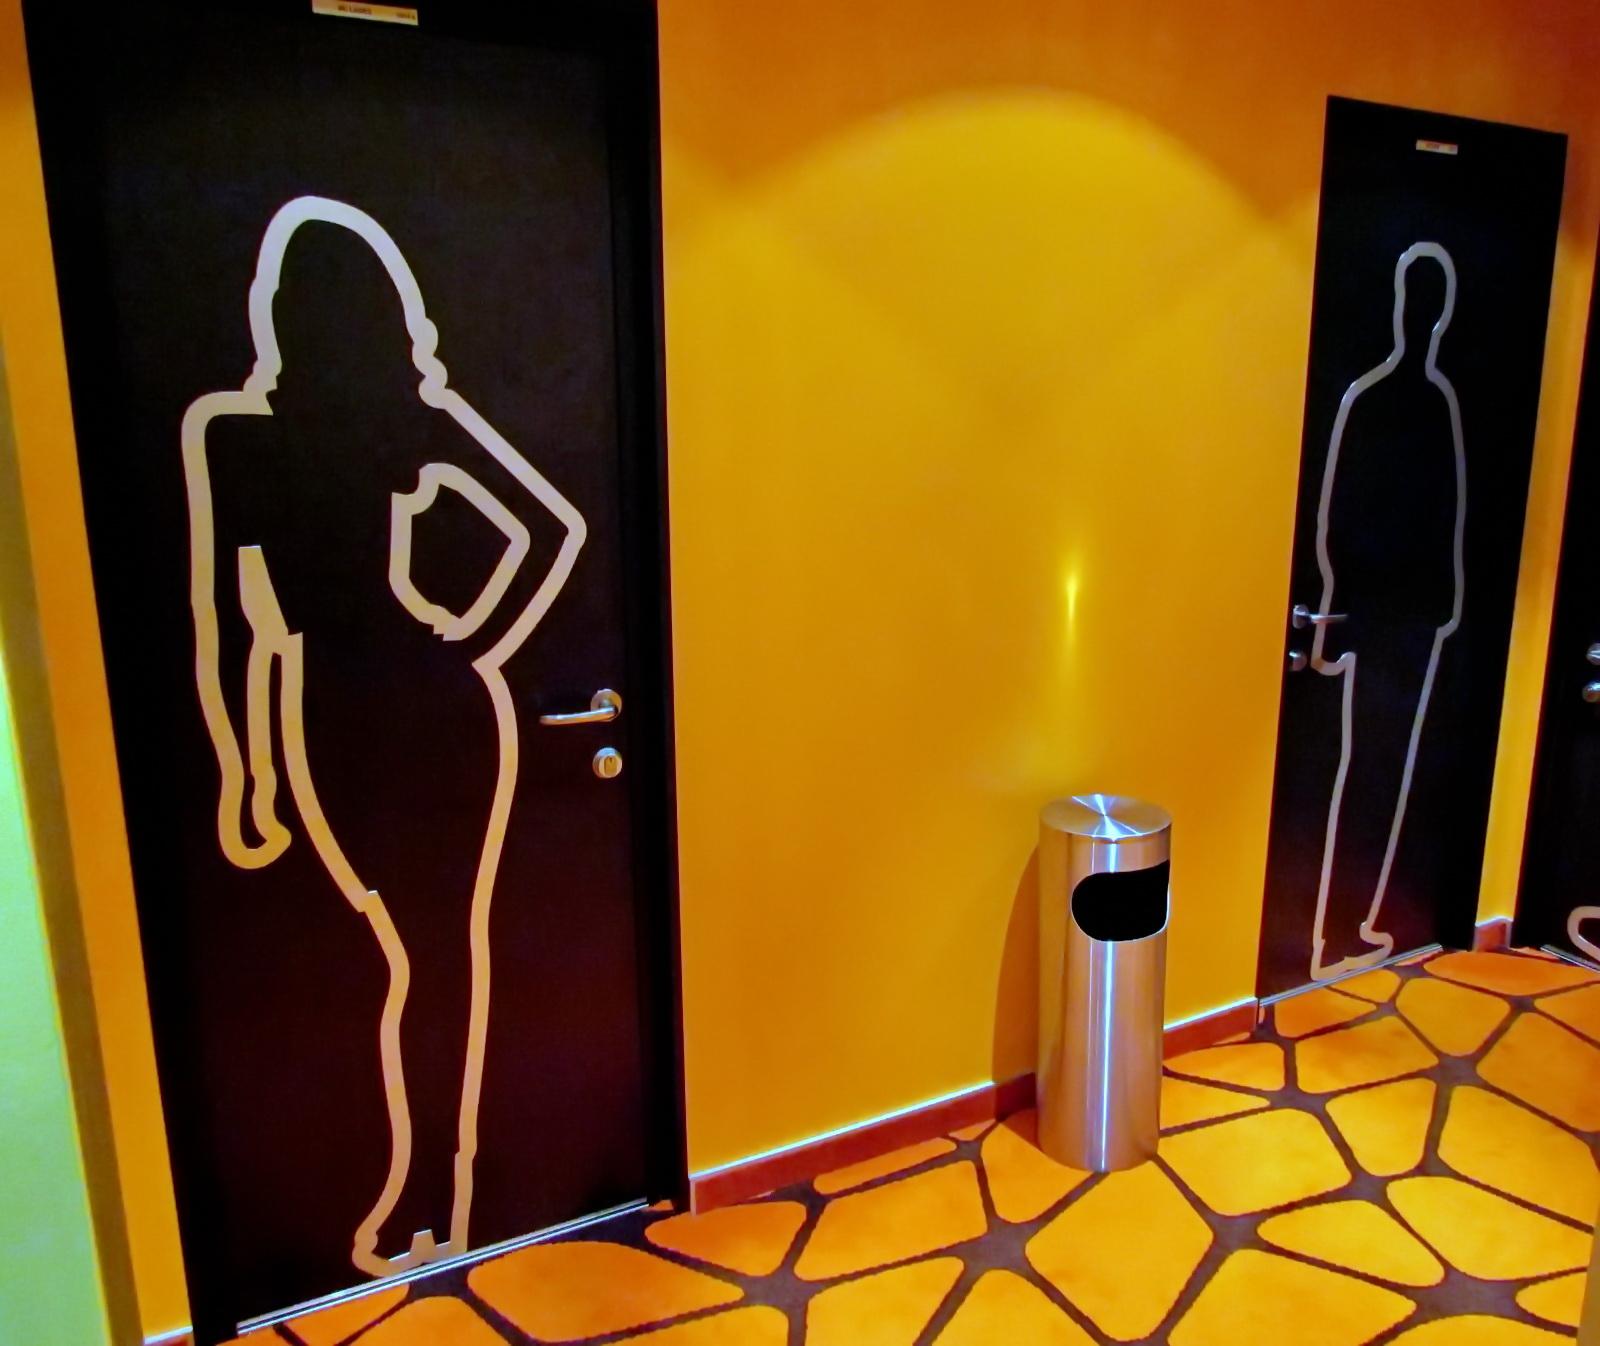 curious toilet signs in AIDAsol cruise ship